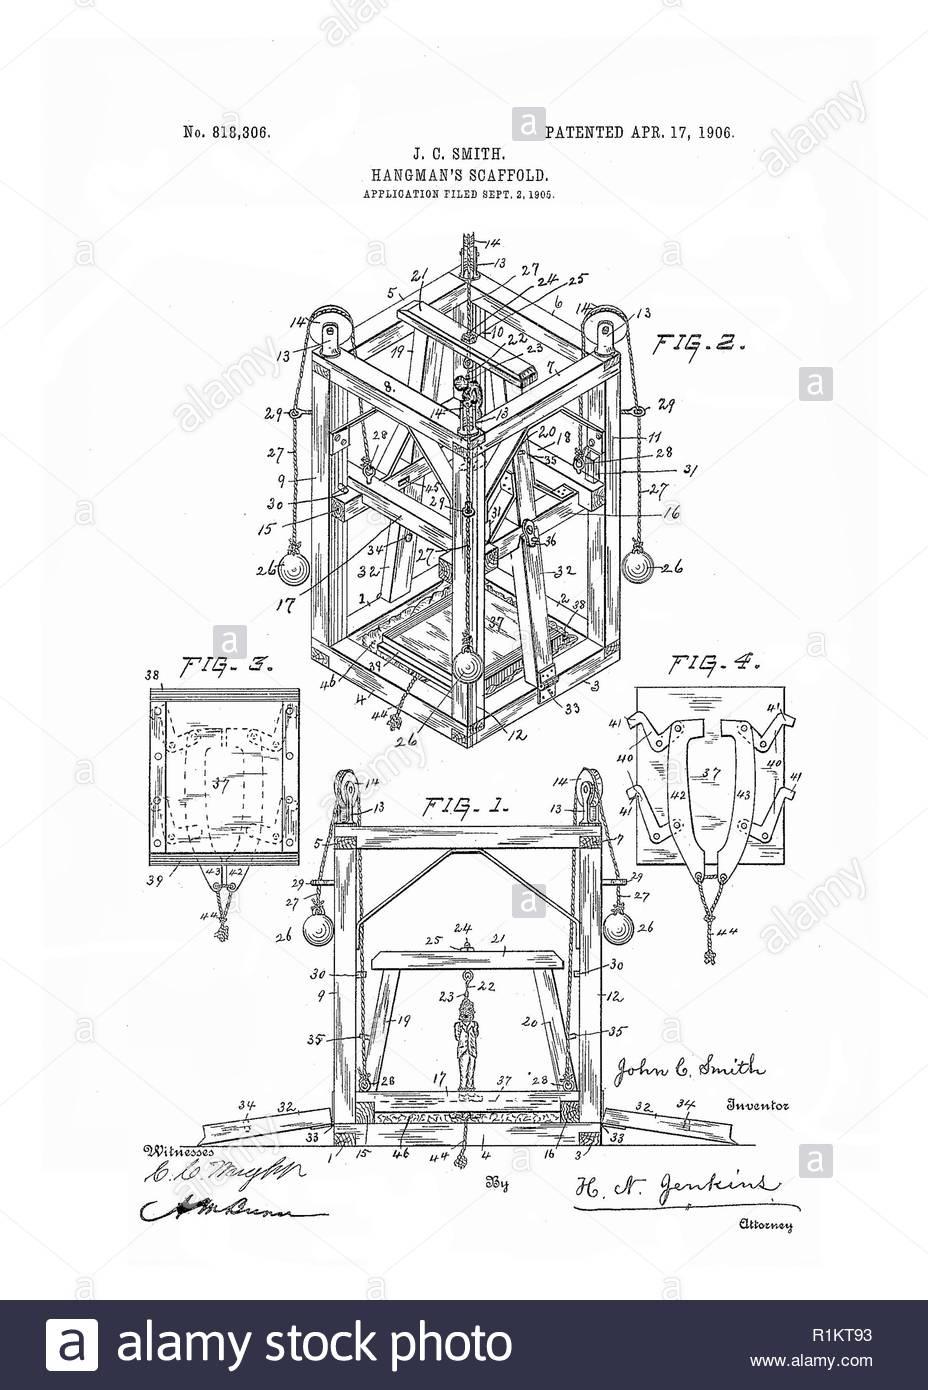 Hangman's scaffold -  original patent drawing Stock Photo